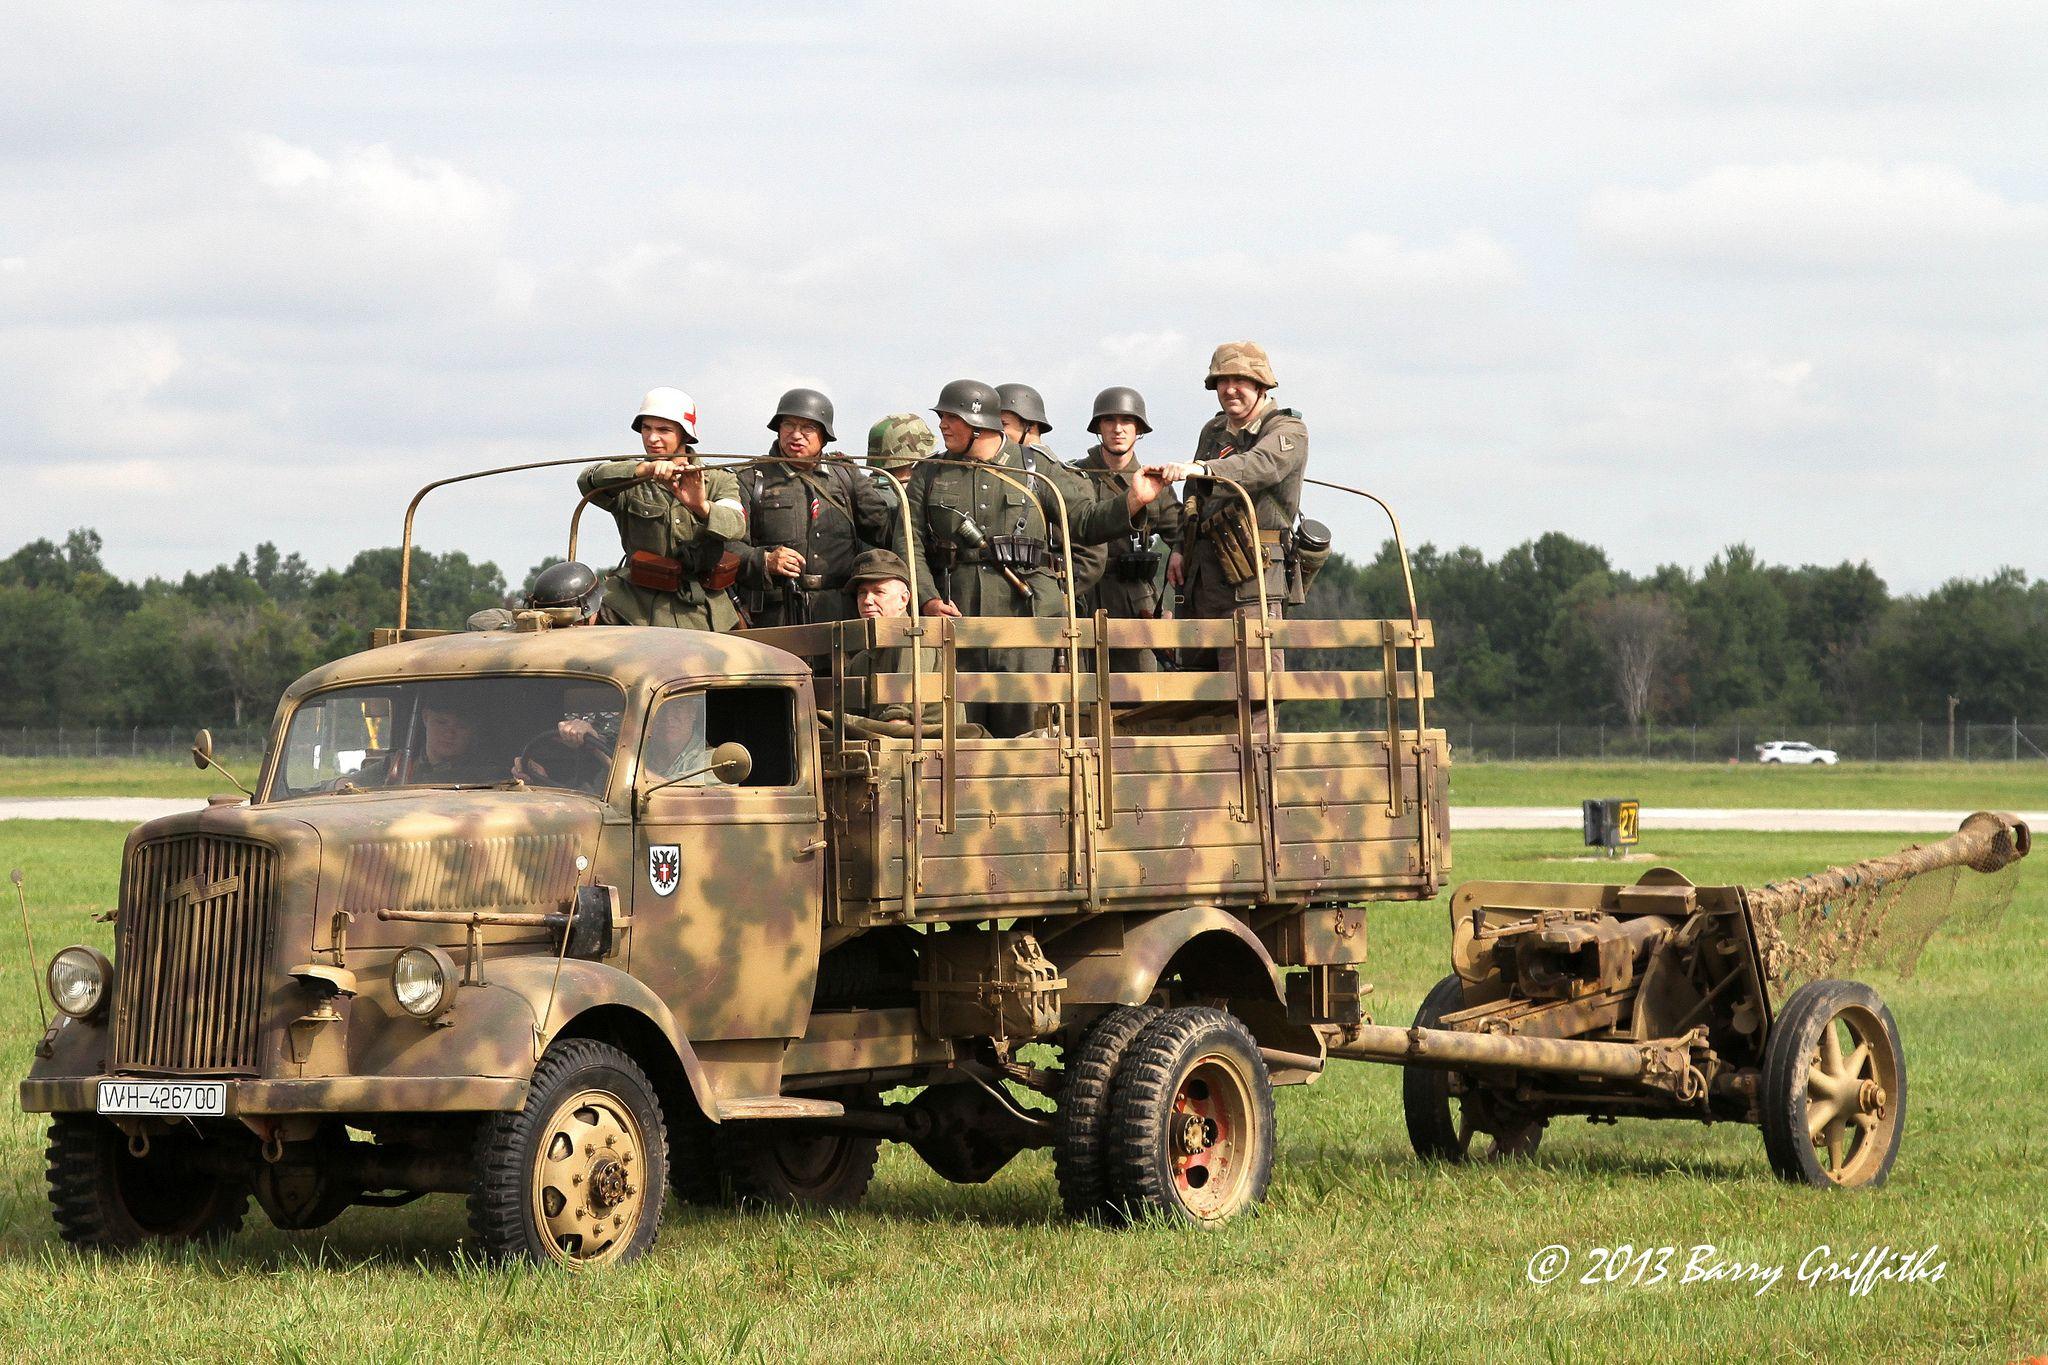 German Army OpelBlitz cargo truck German army and Army